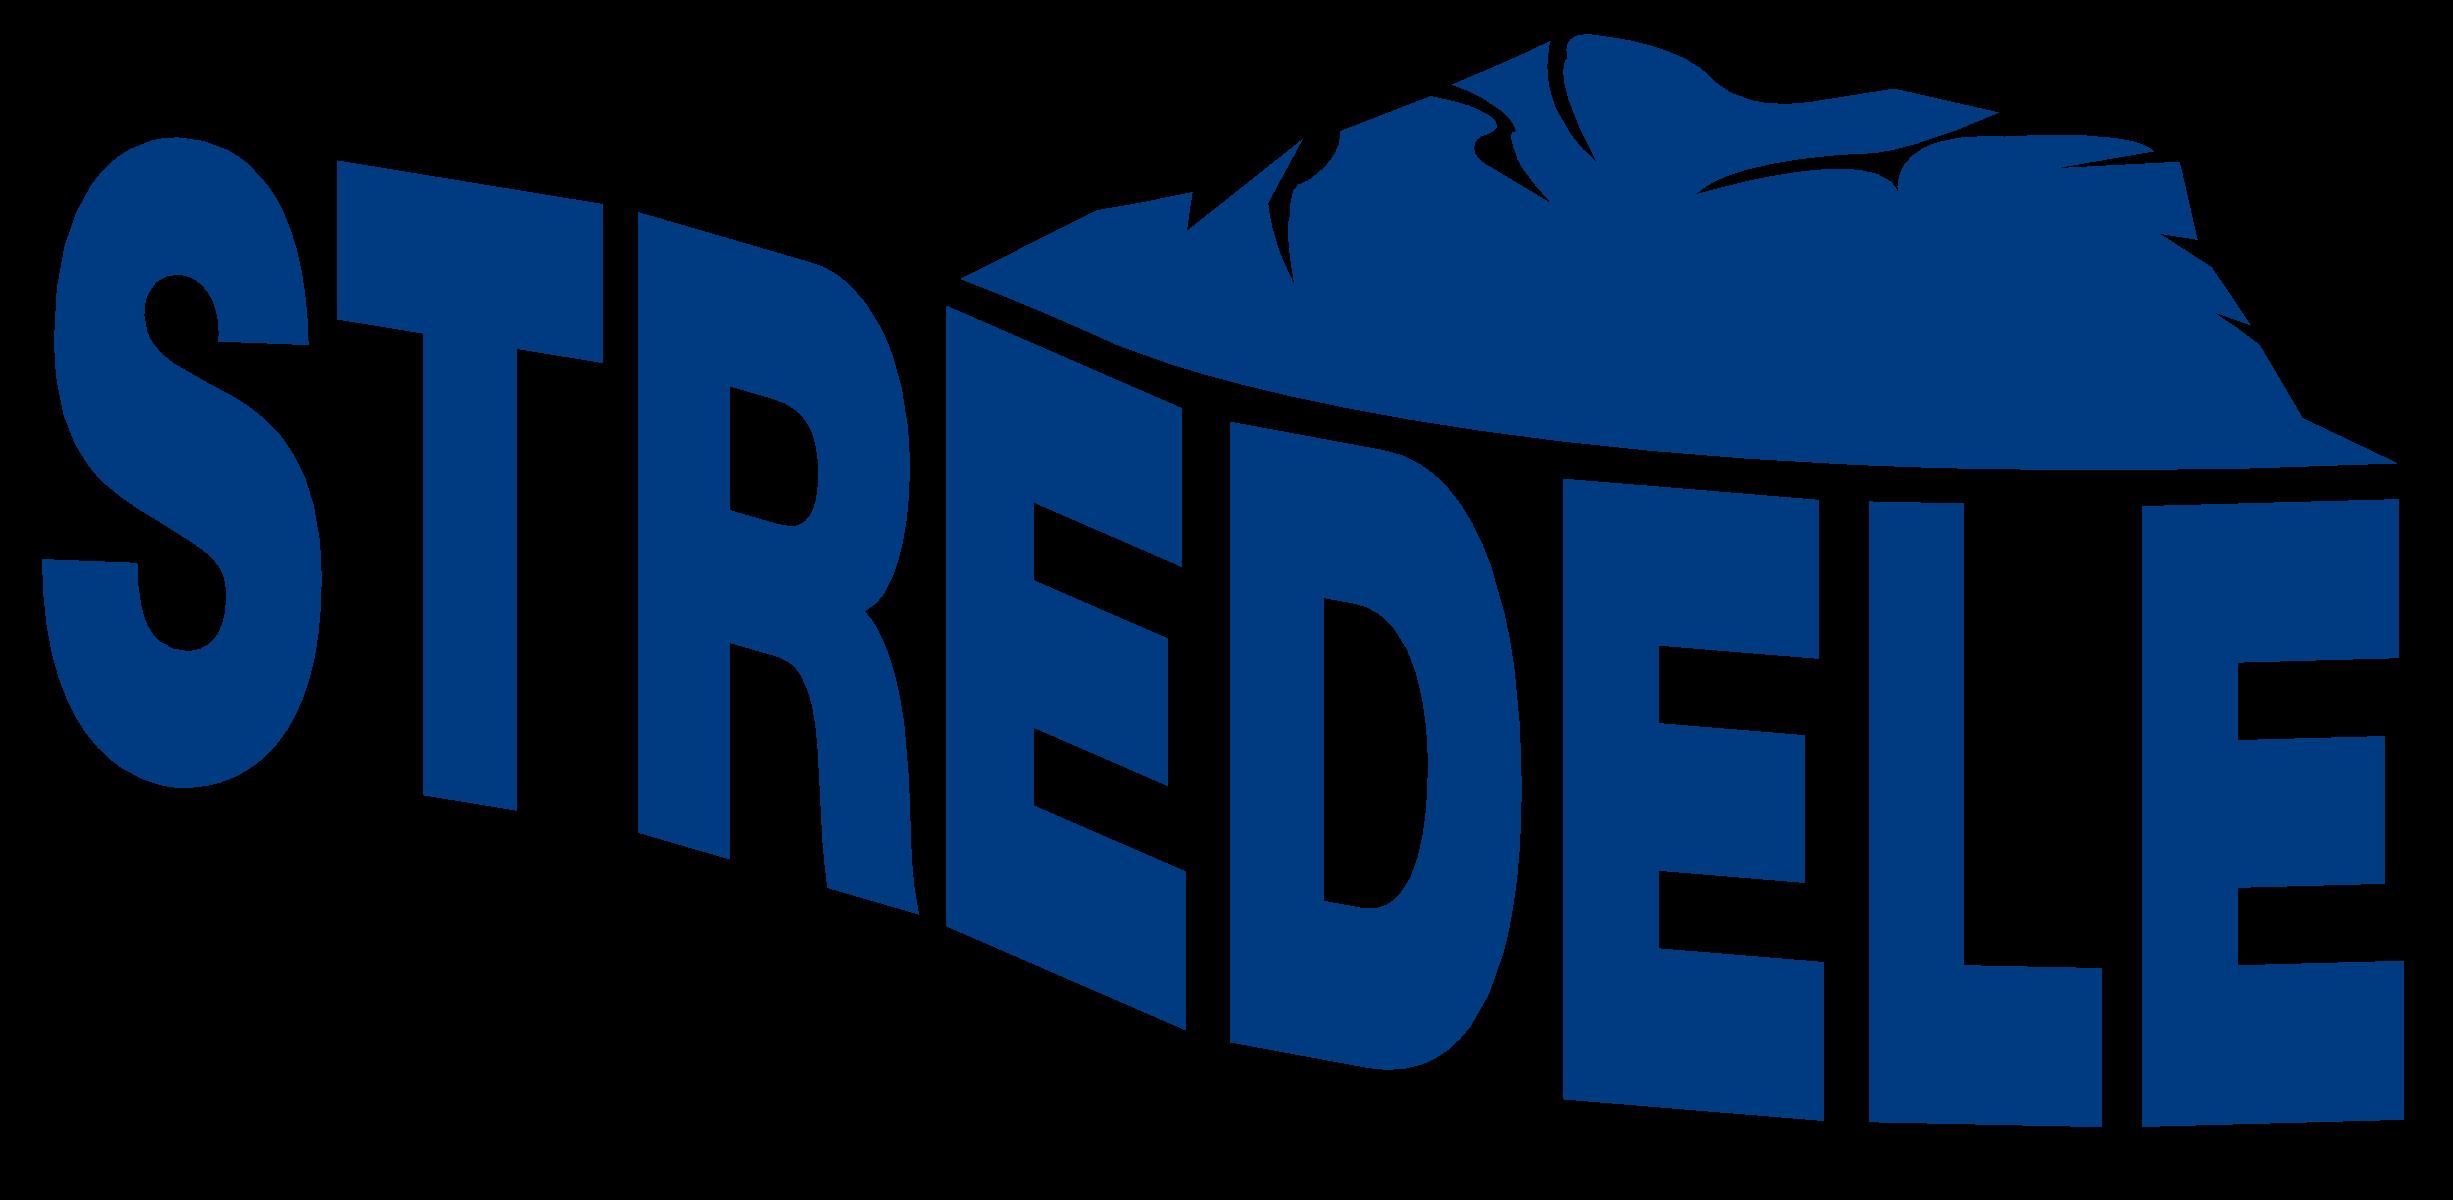 Stredele Logo